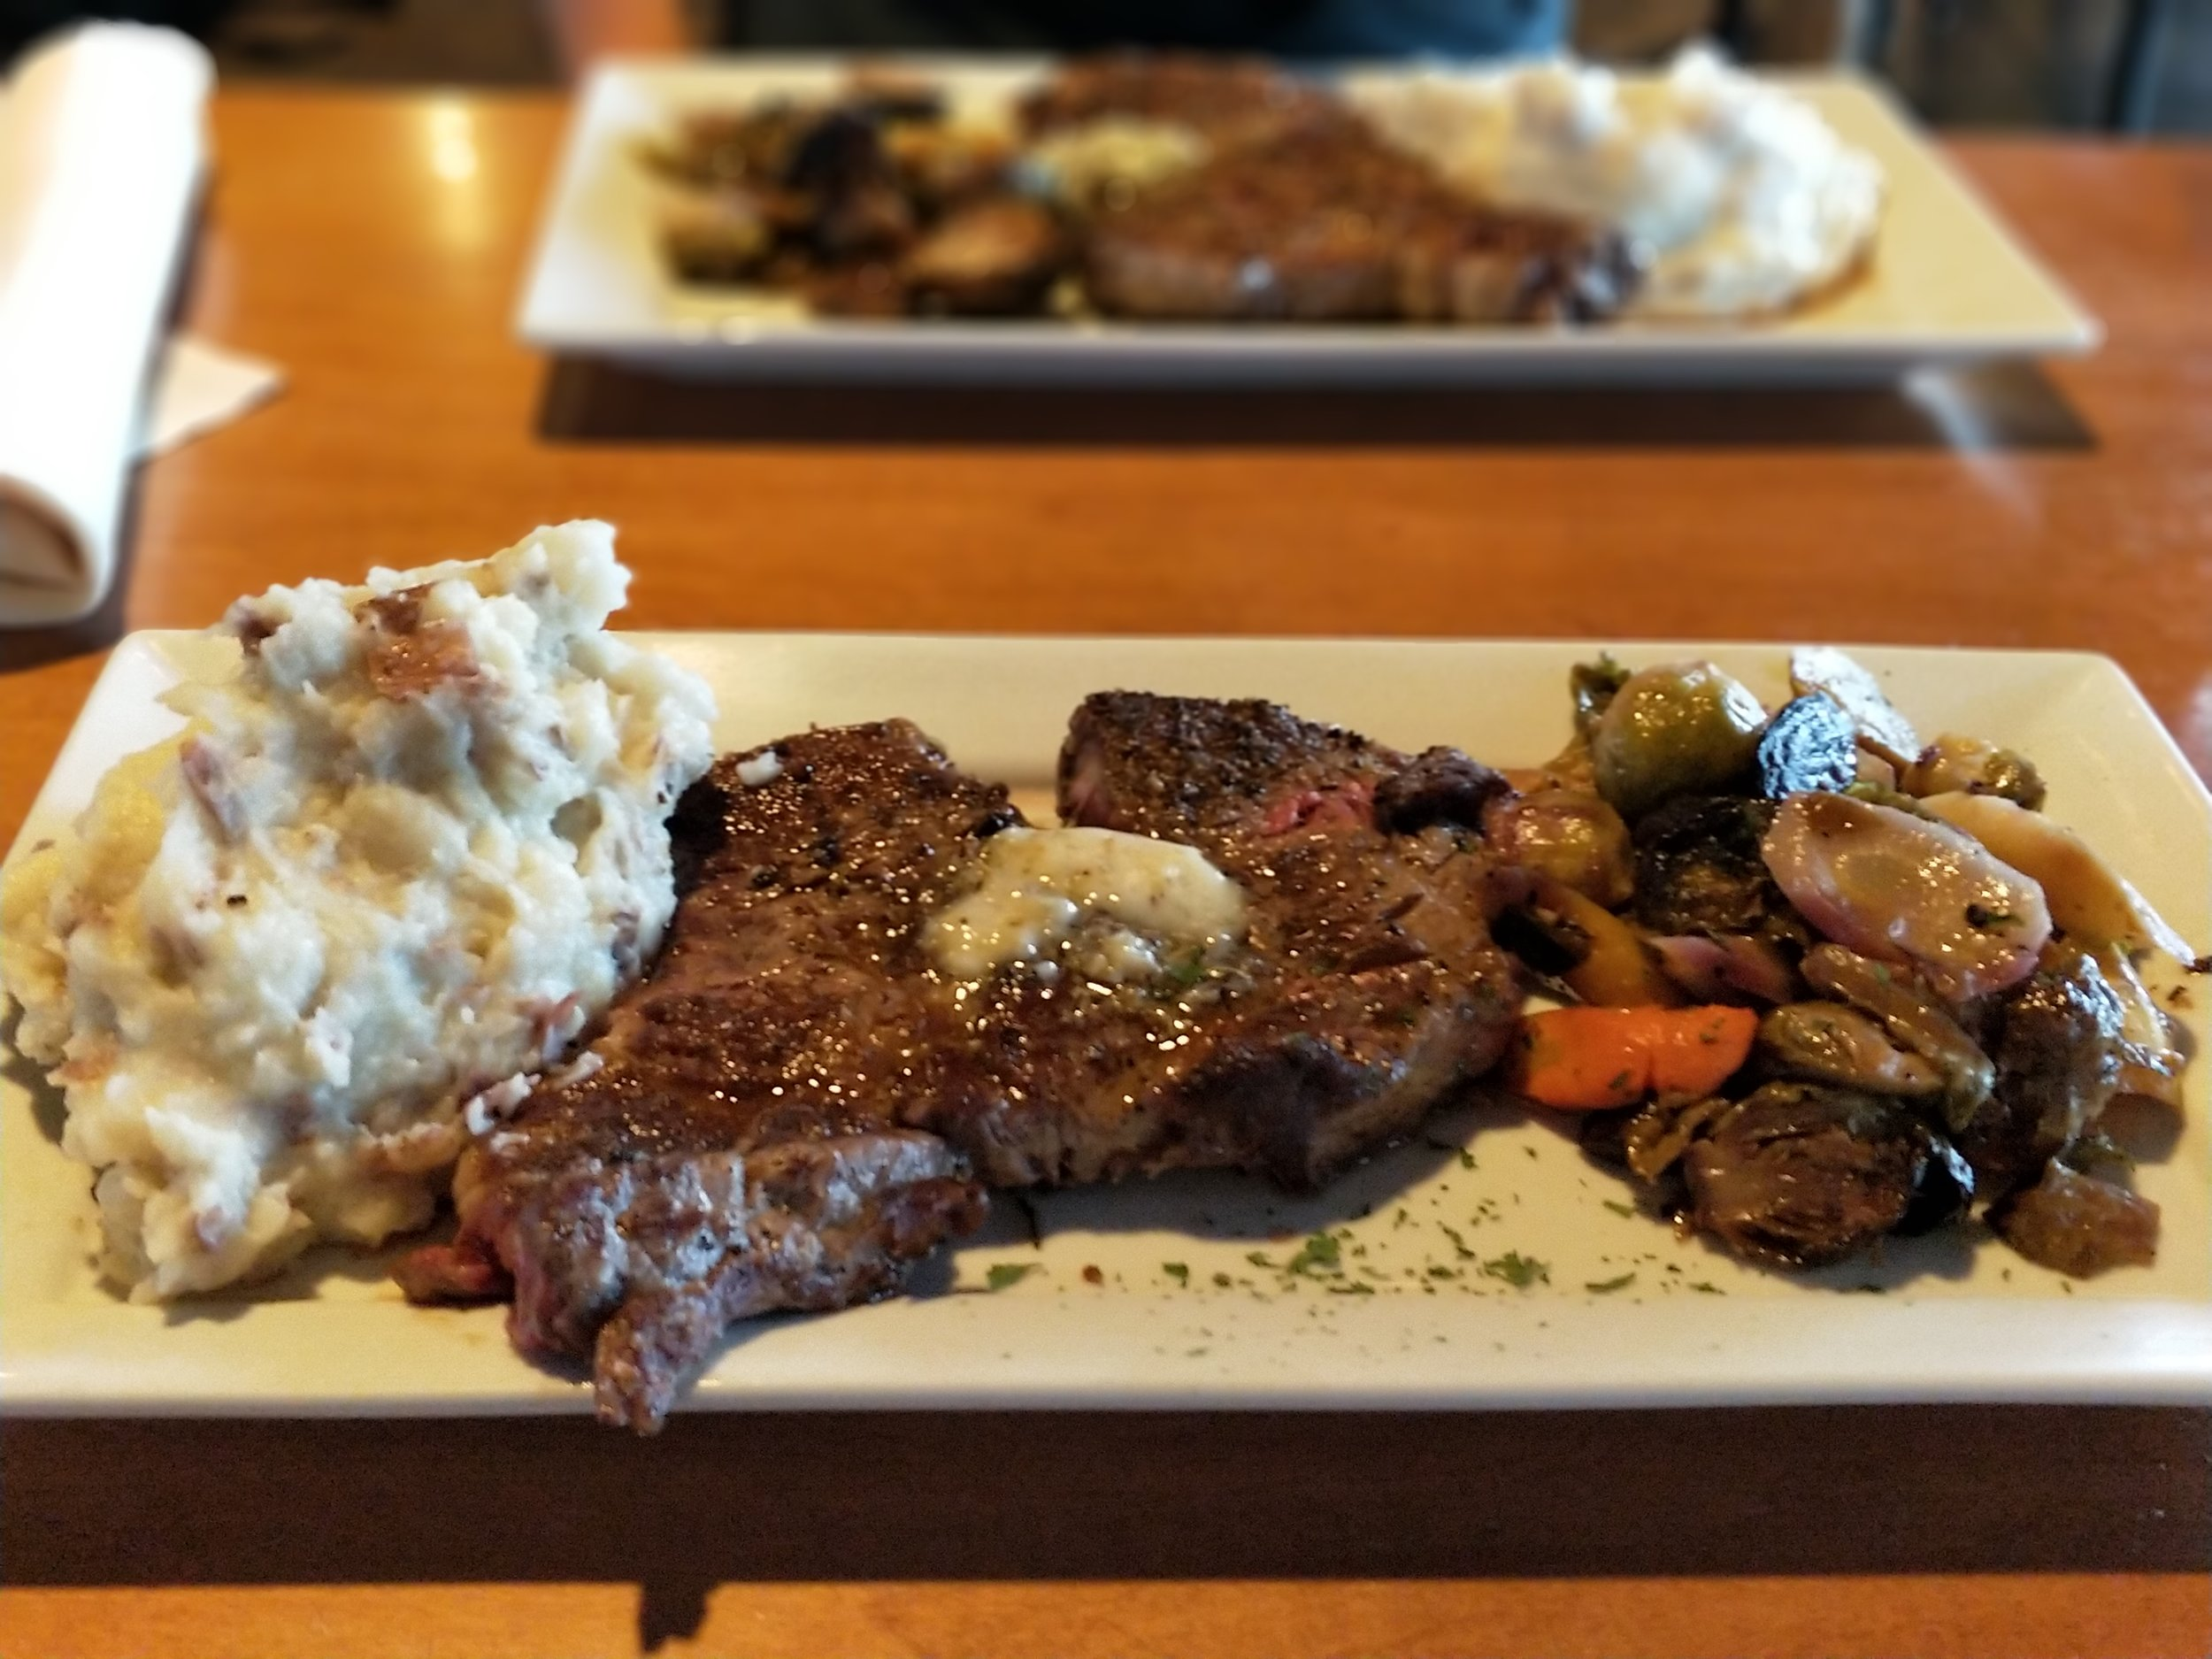 12 oz ribeye steak